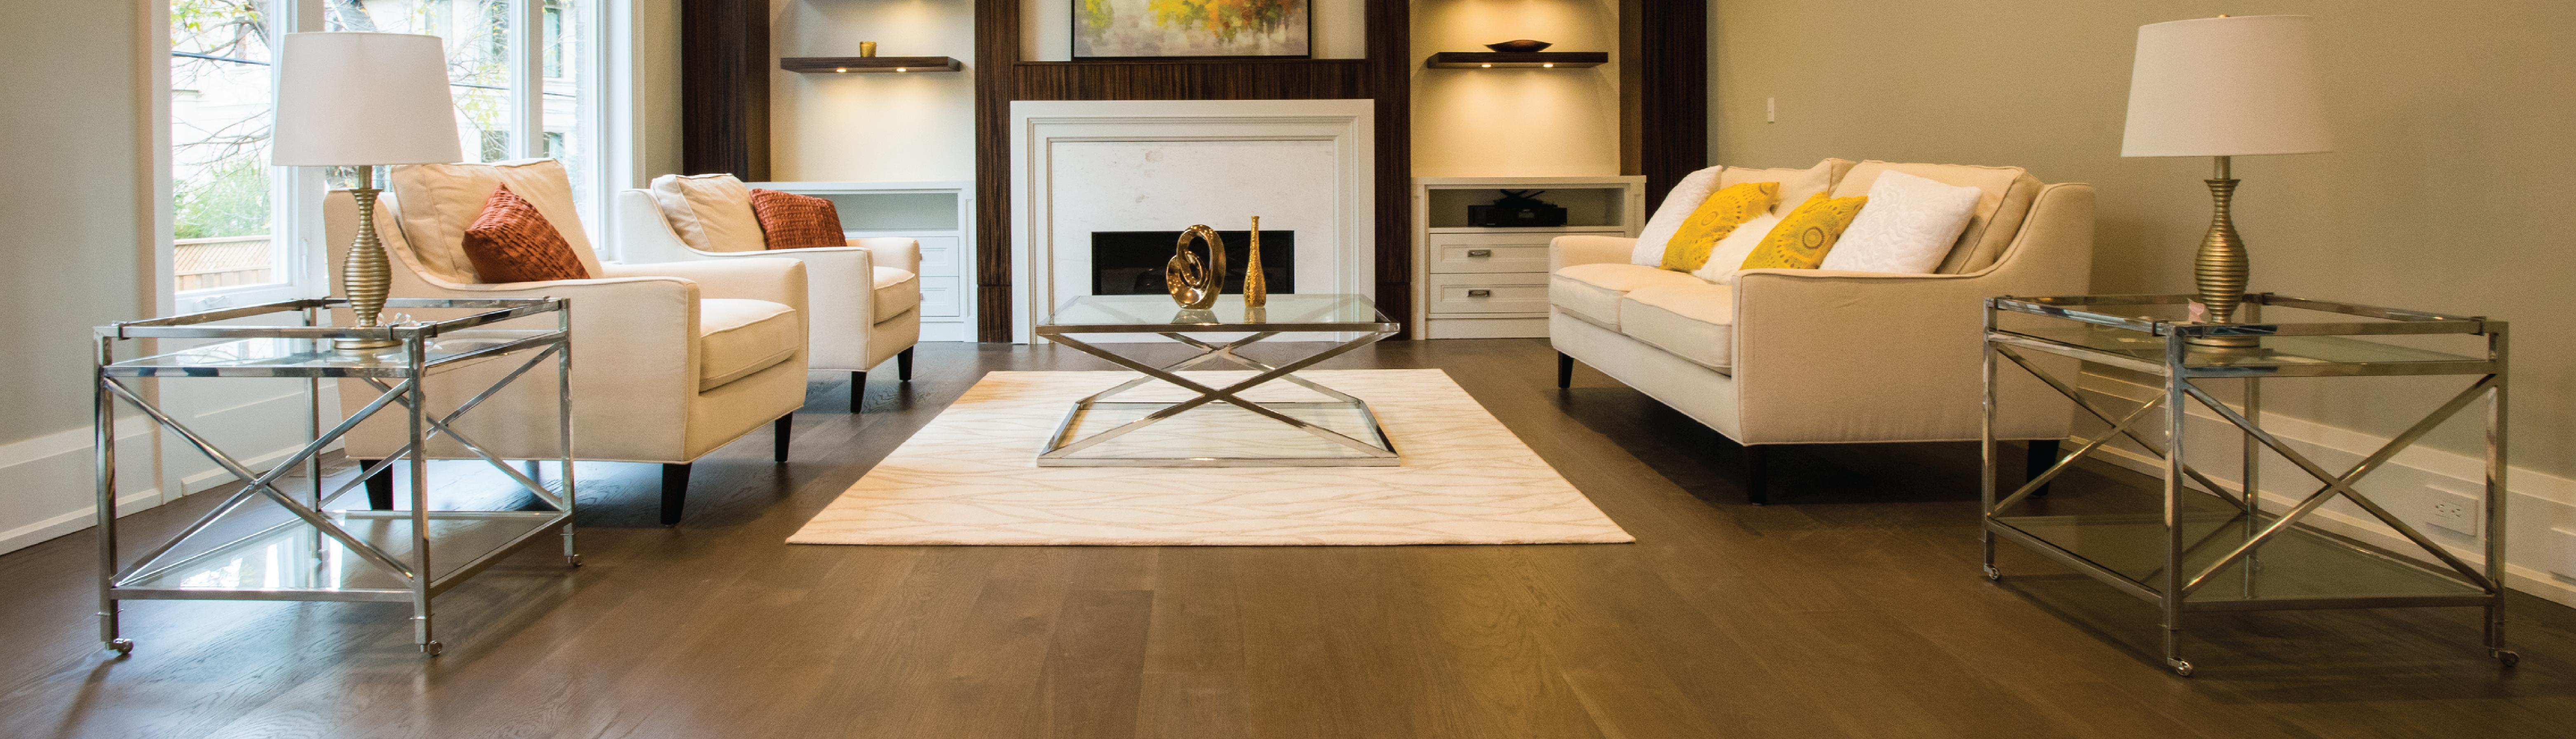 Advanced flooring supplies saskatoon 7 small but - Grille avancement attache territorial ...